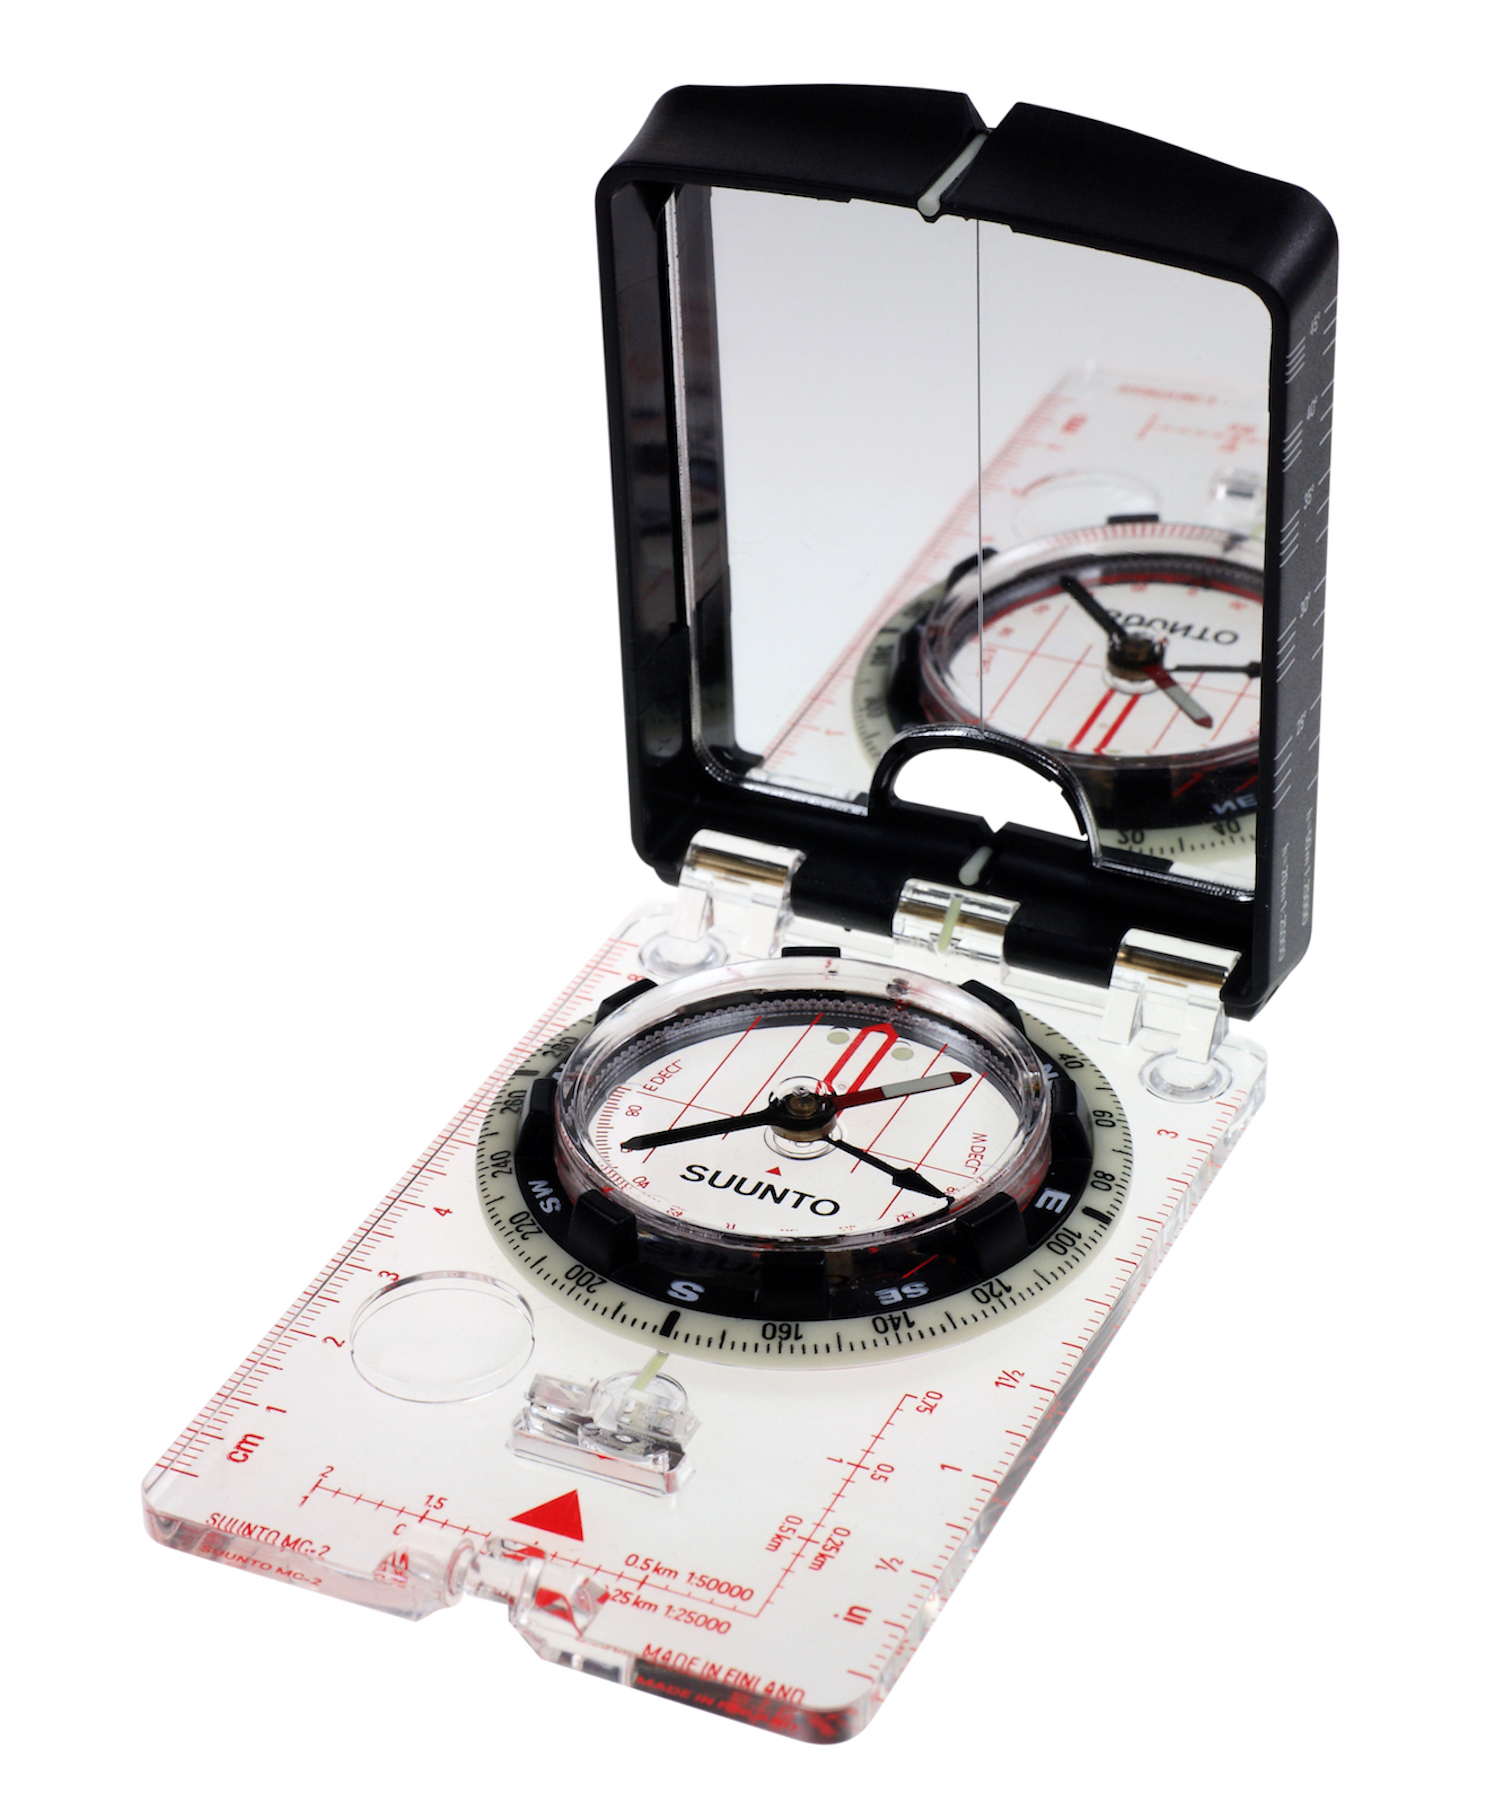 Suunto - MC-2 NH Mirror - Compass